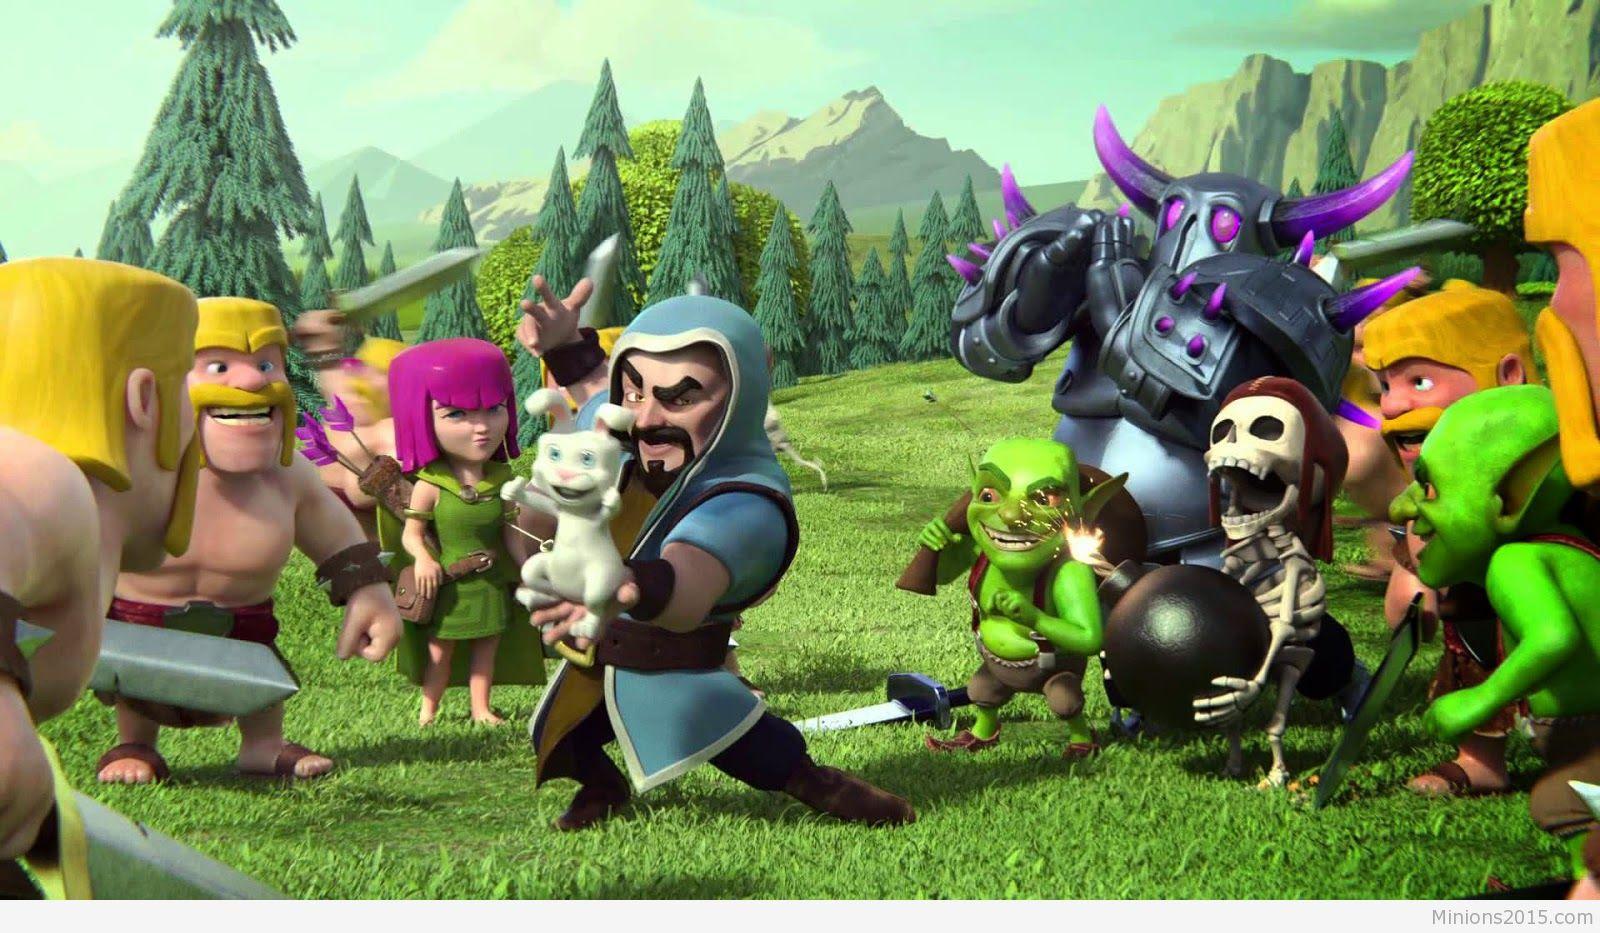 Download Clash Clans Wallpaper Hd 1080p Pc